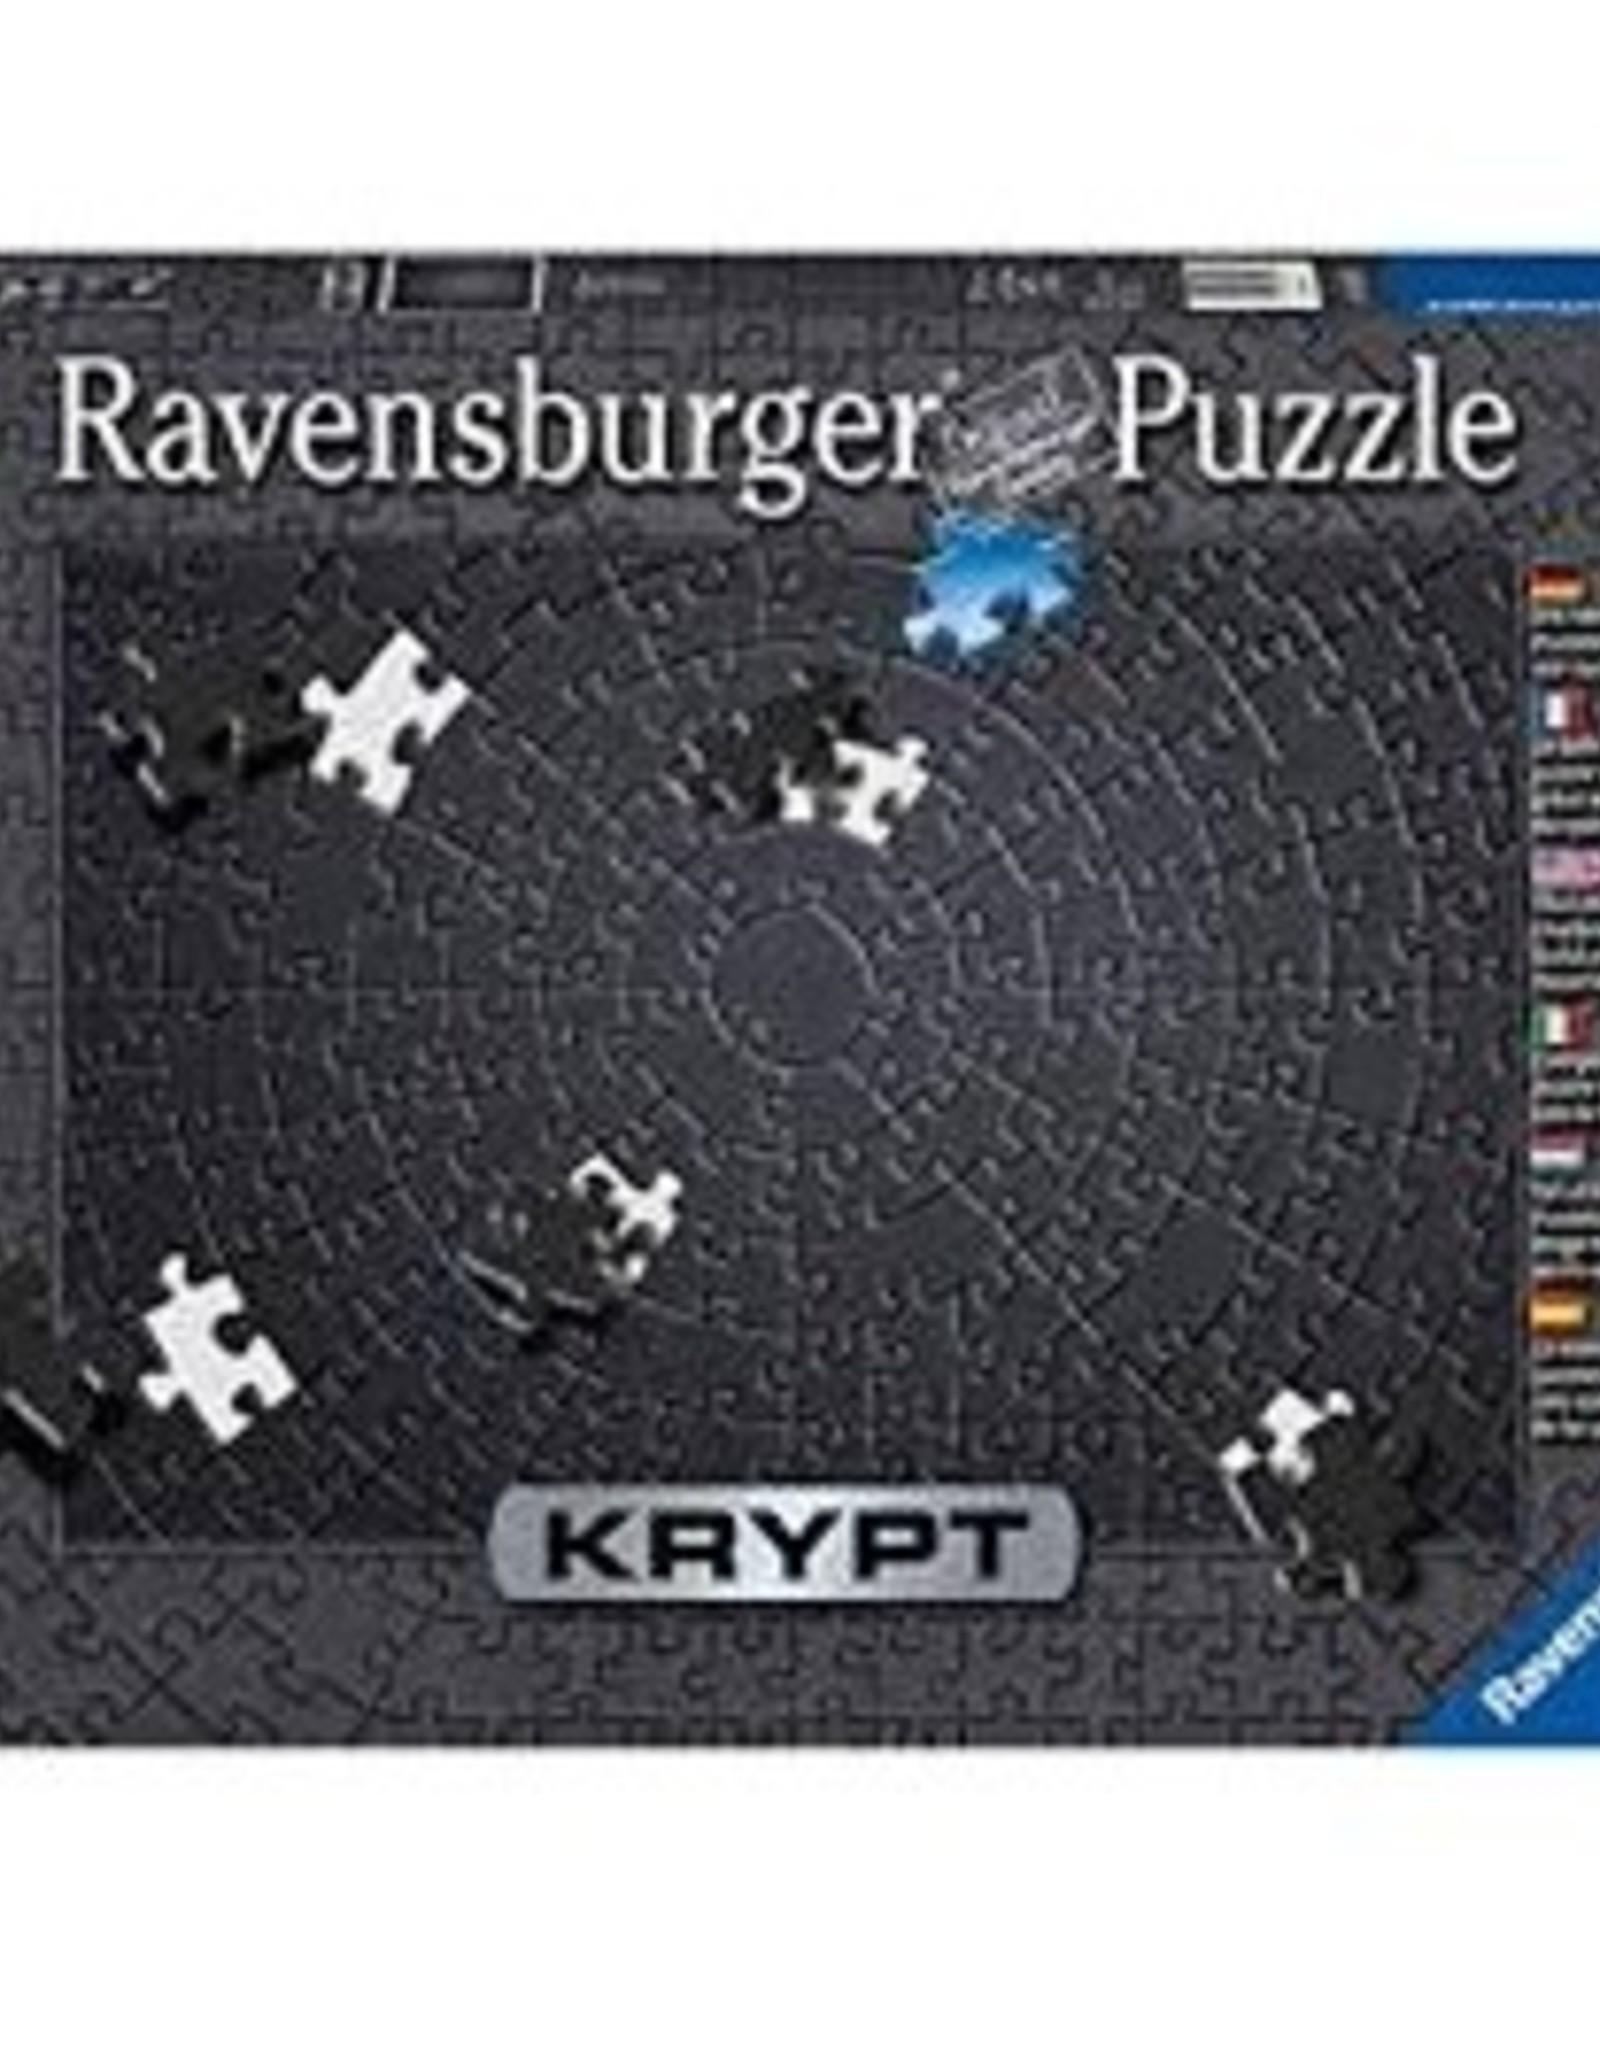 Krypt Black (654 pc Puzzle)